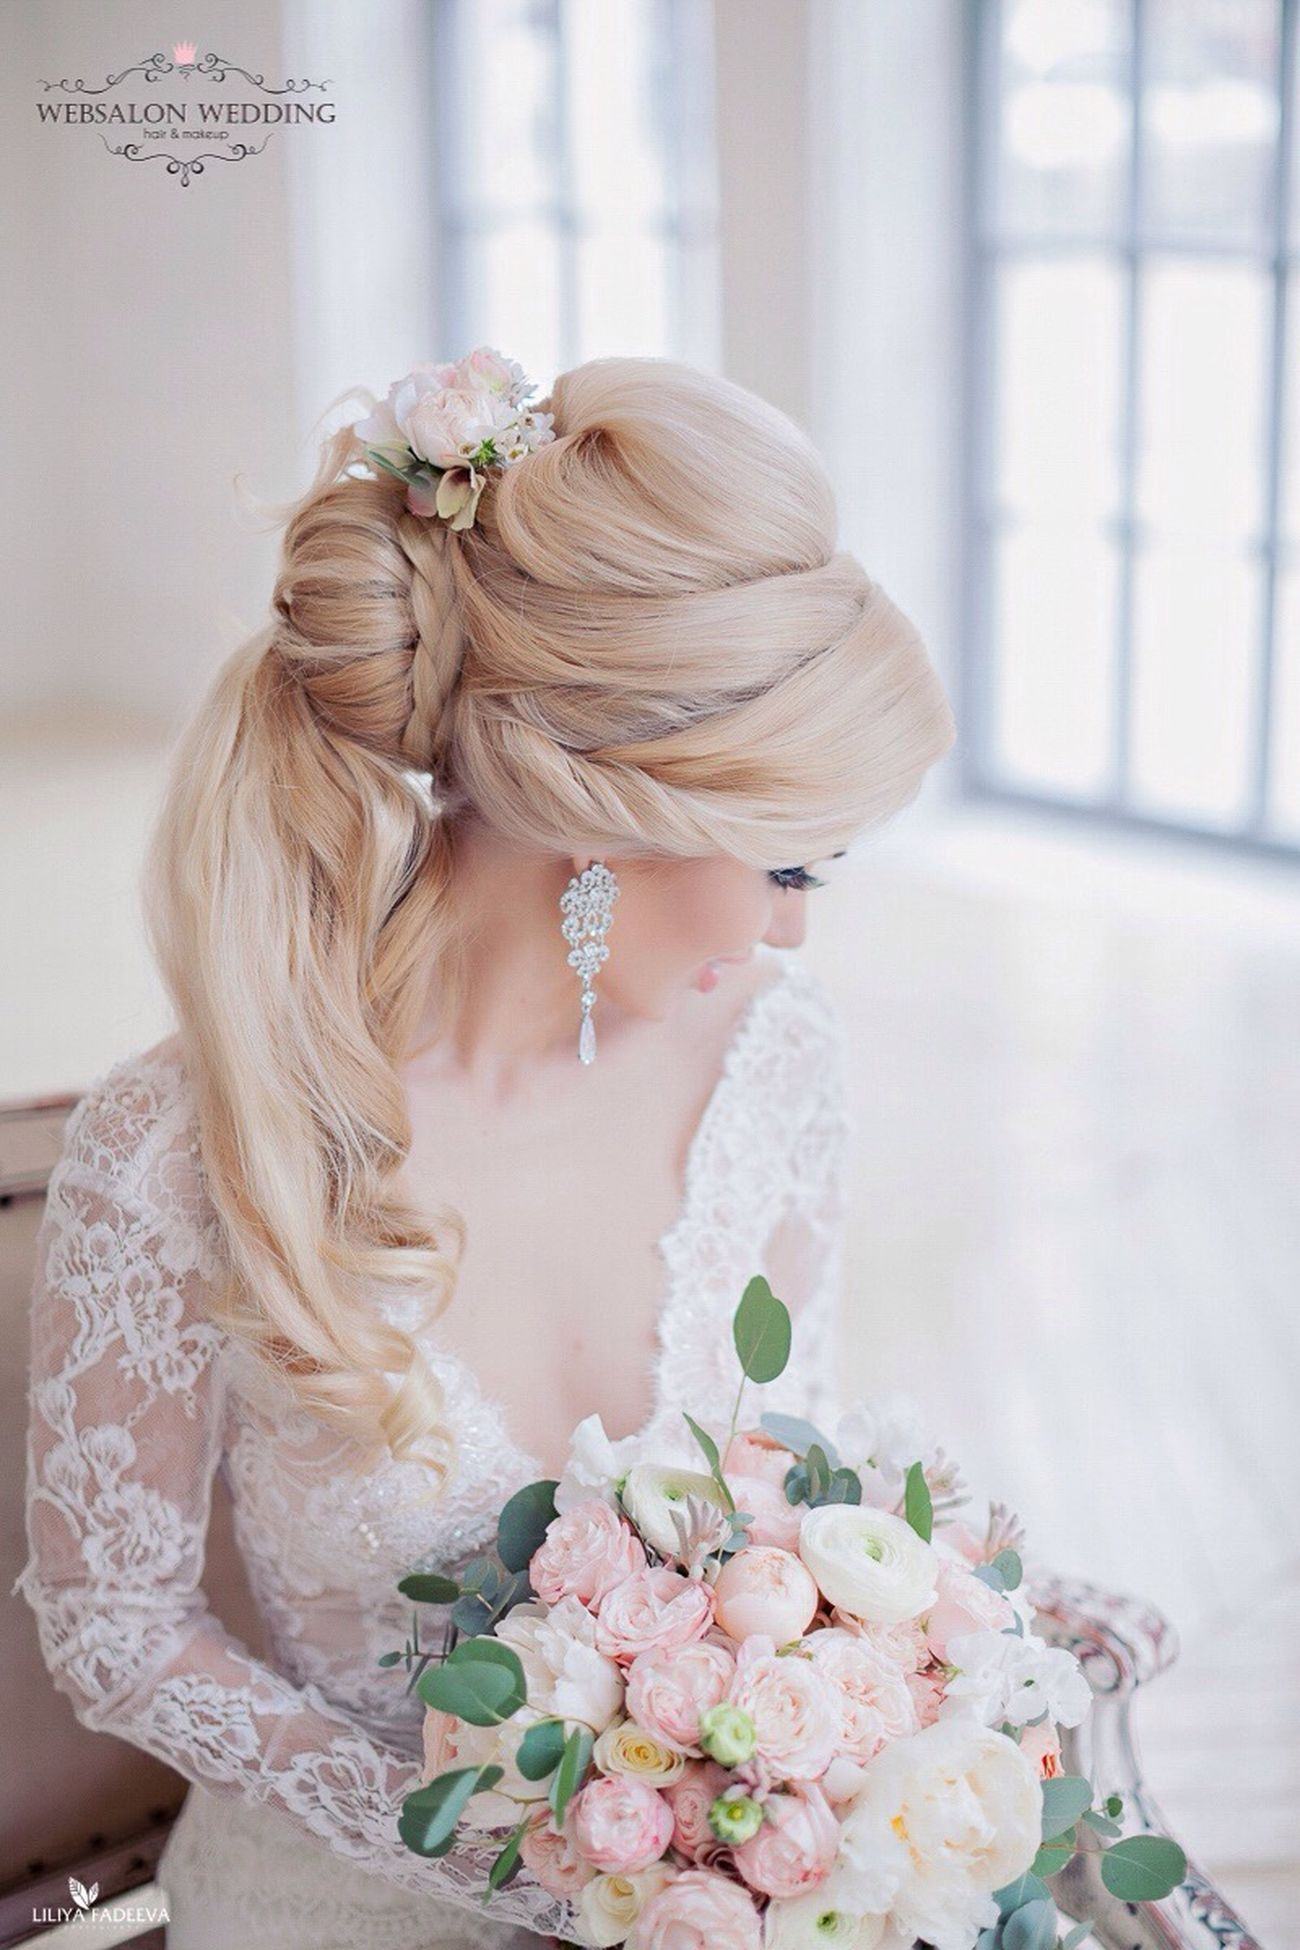 Wedding Dress Novia2015 Happy Wedding Wedding2015 Wedding Photography Blonde Girl Blondie Fashion Hair Girl Hairstylist